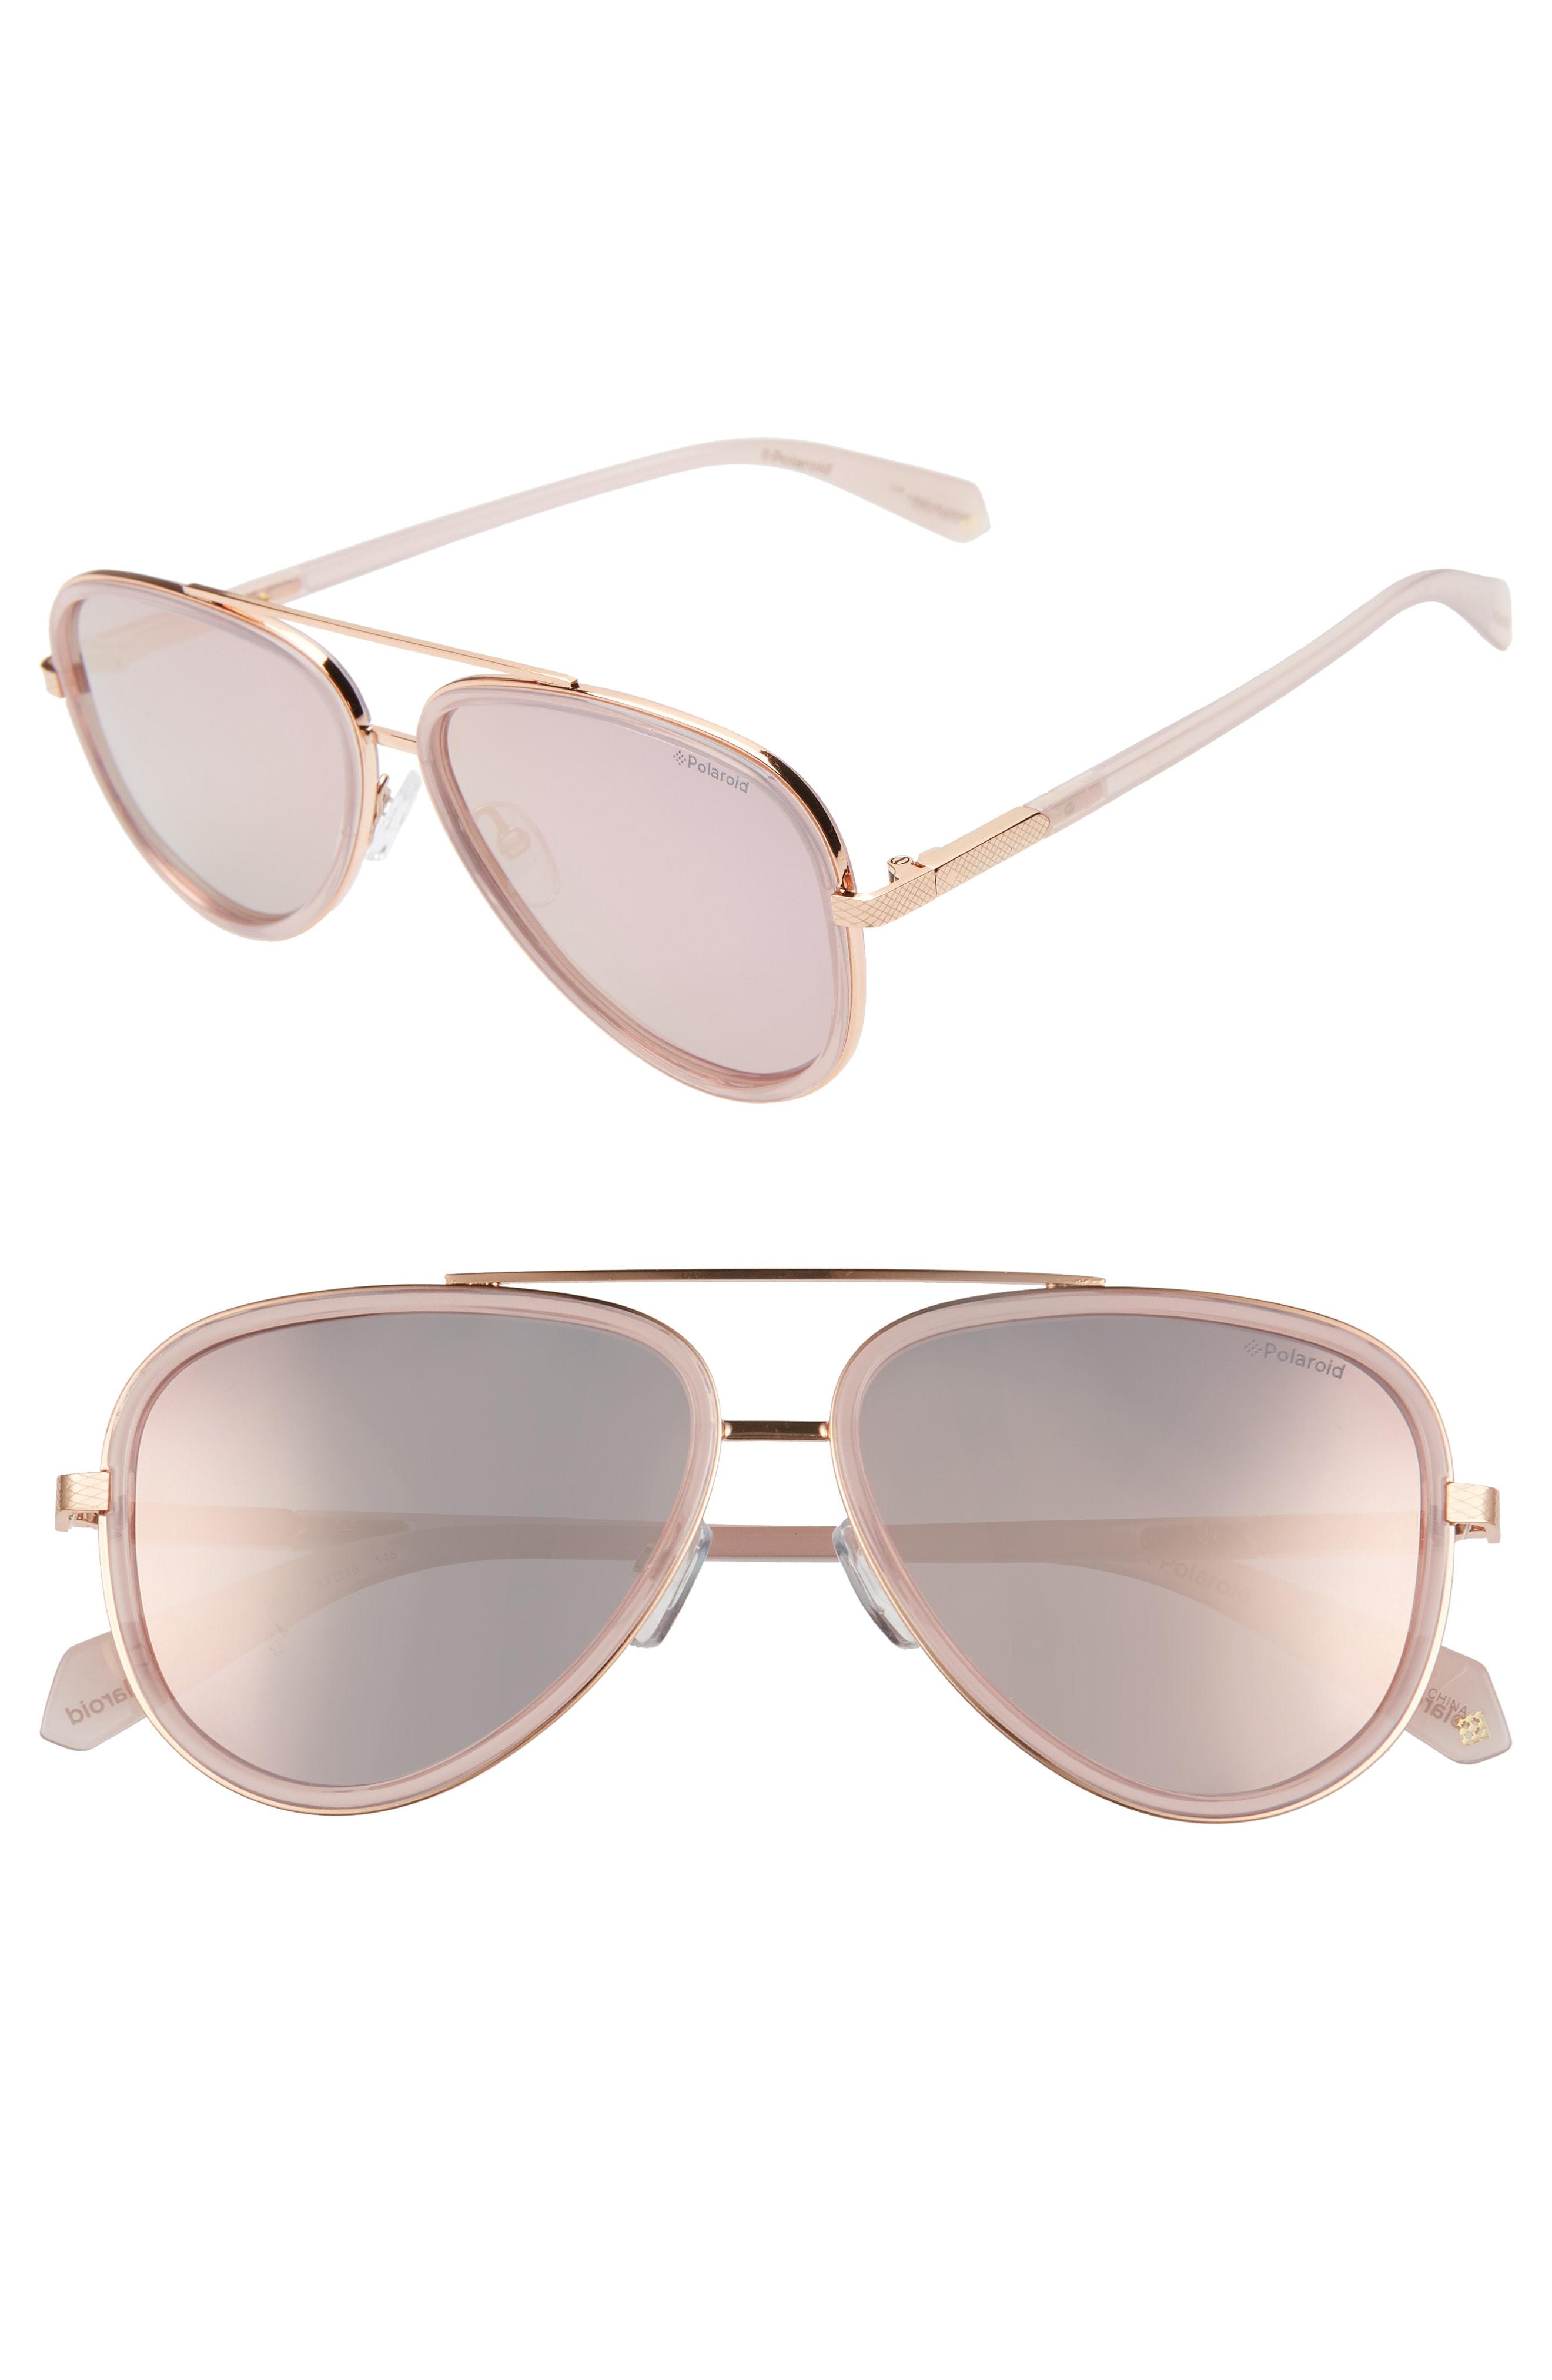 fbfcbfb230ce4 Polaroid 60Mm Polarized Round Aviator Sunglasses - Gold  Pink